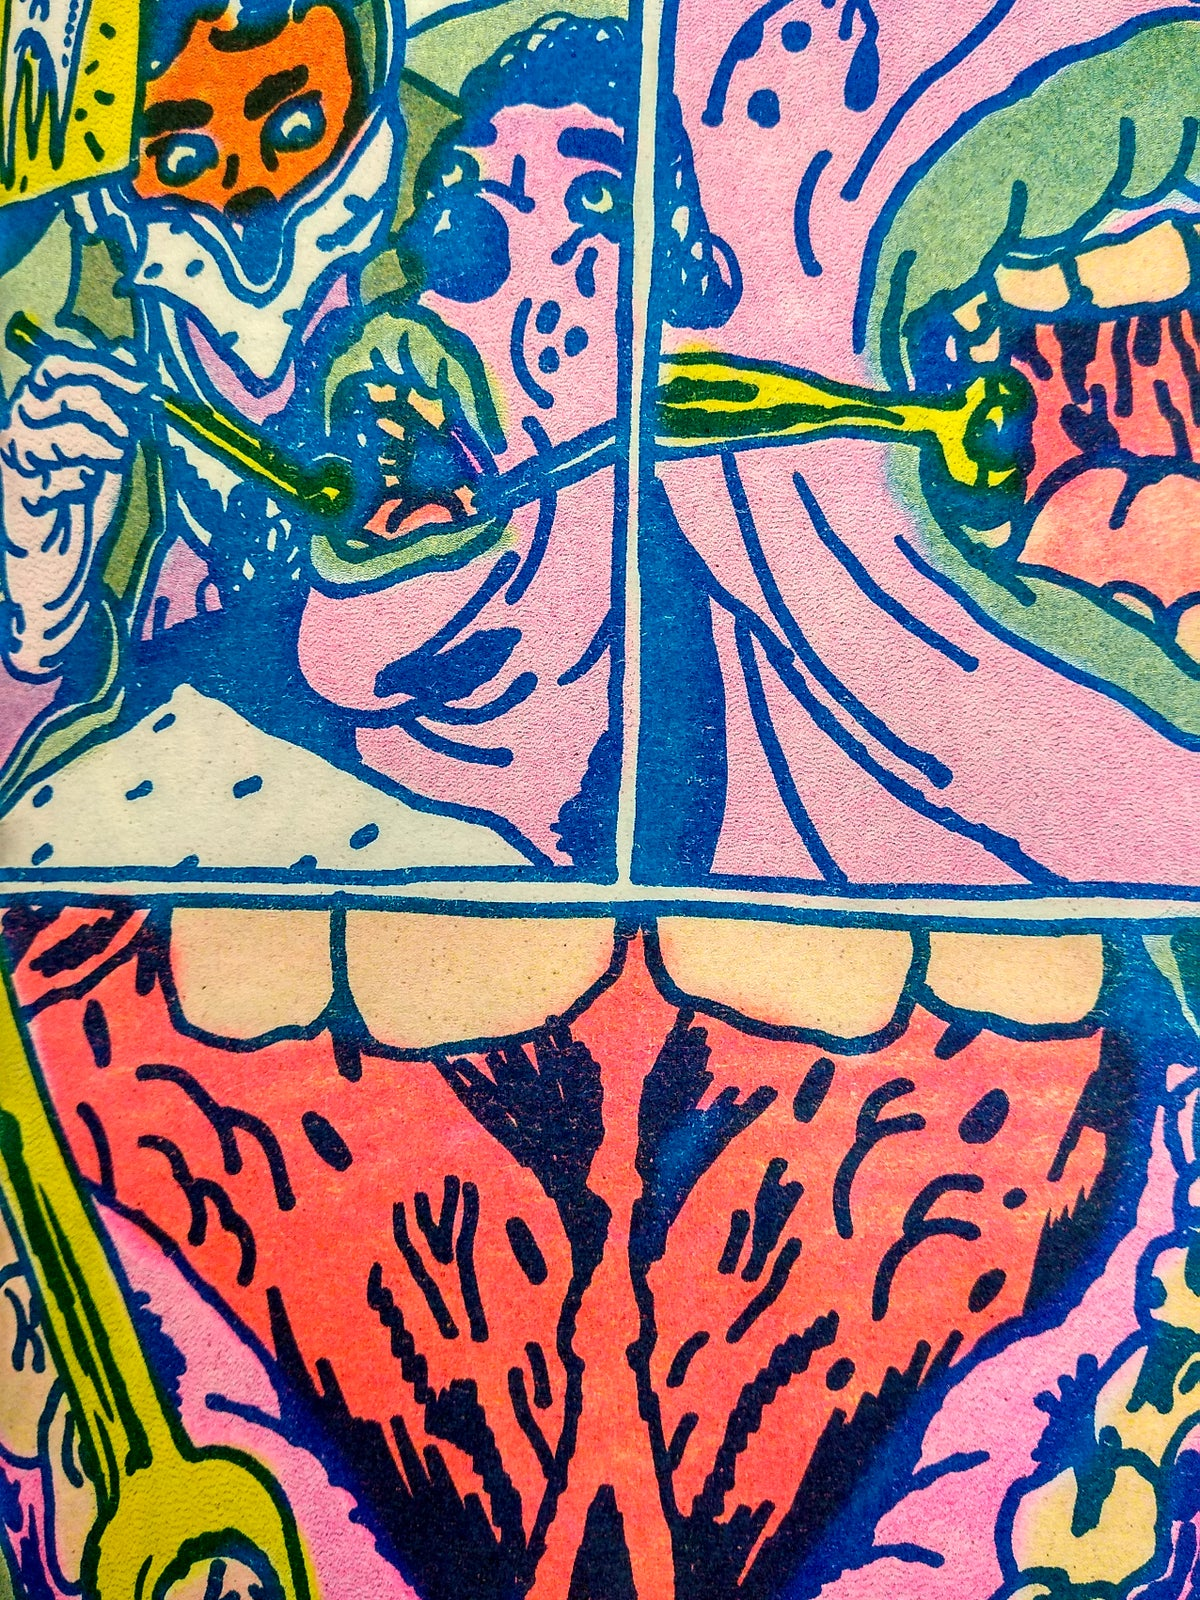 Image of Pain Courtain Comics